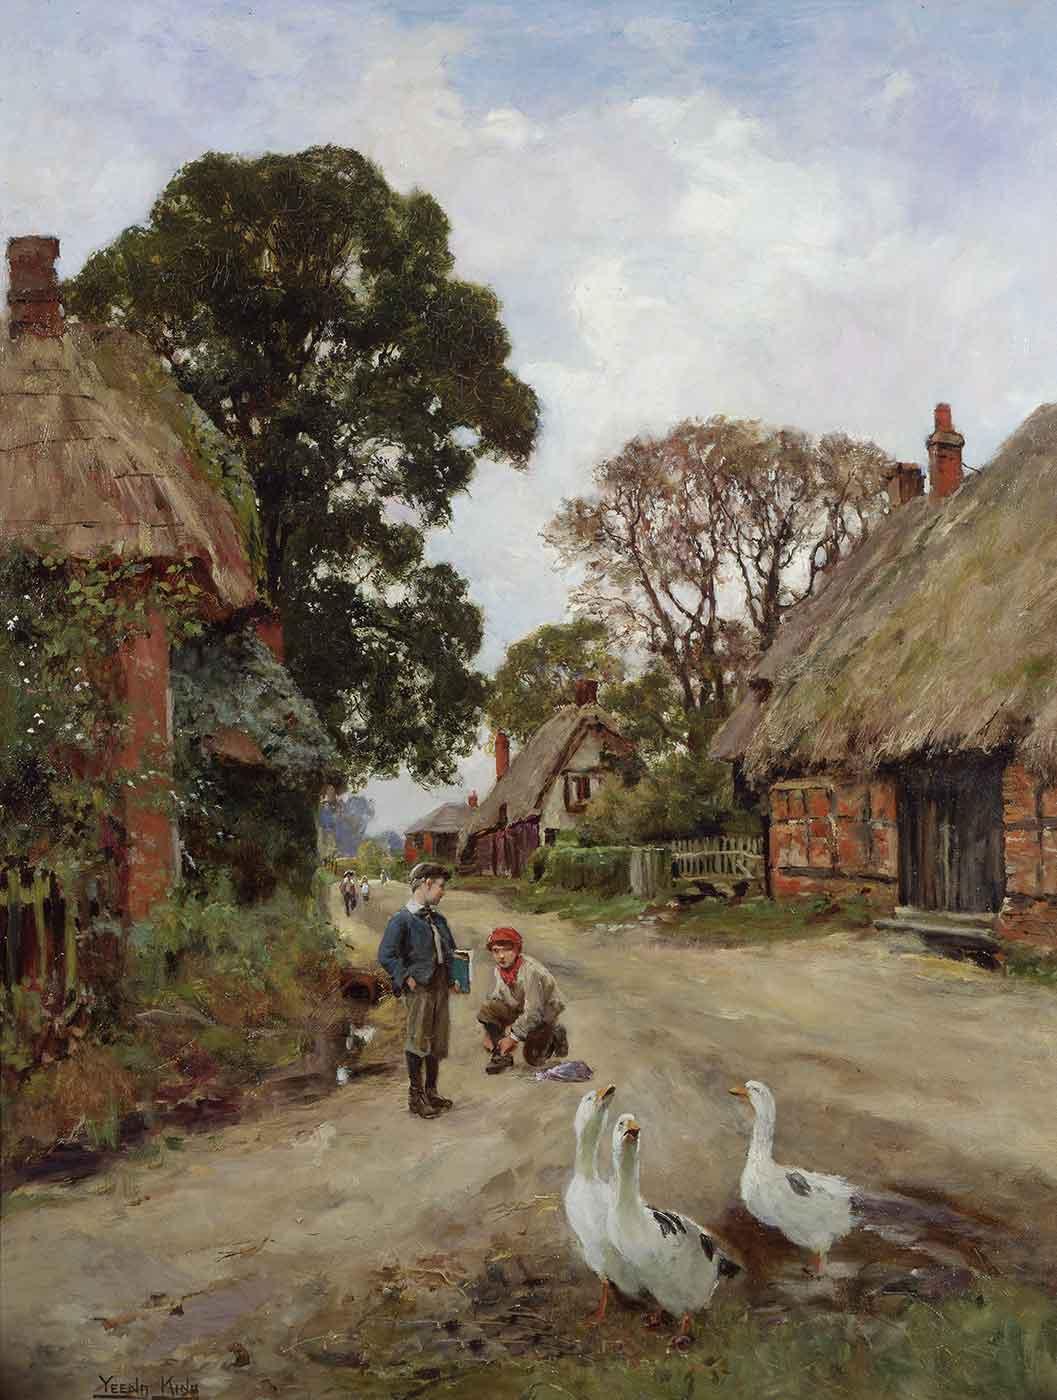 Off to School by Henry John Yeend King